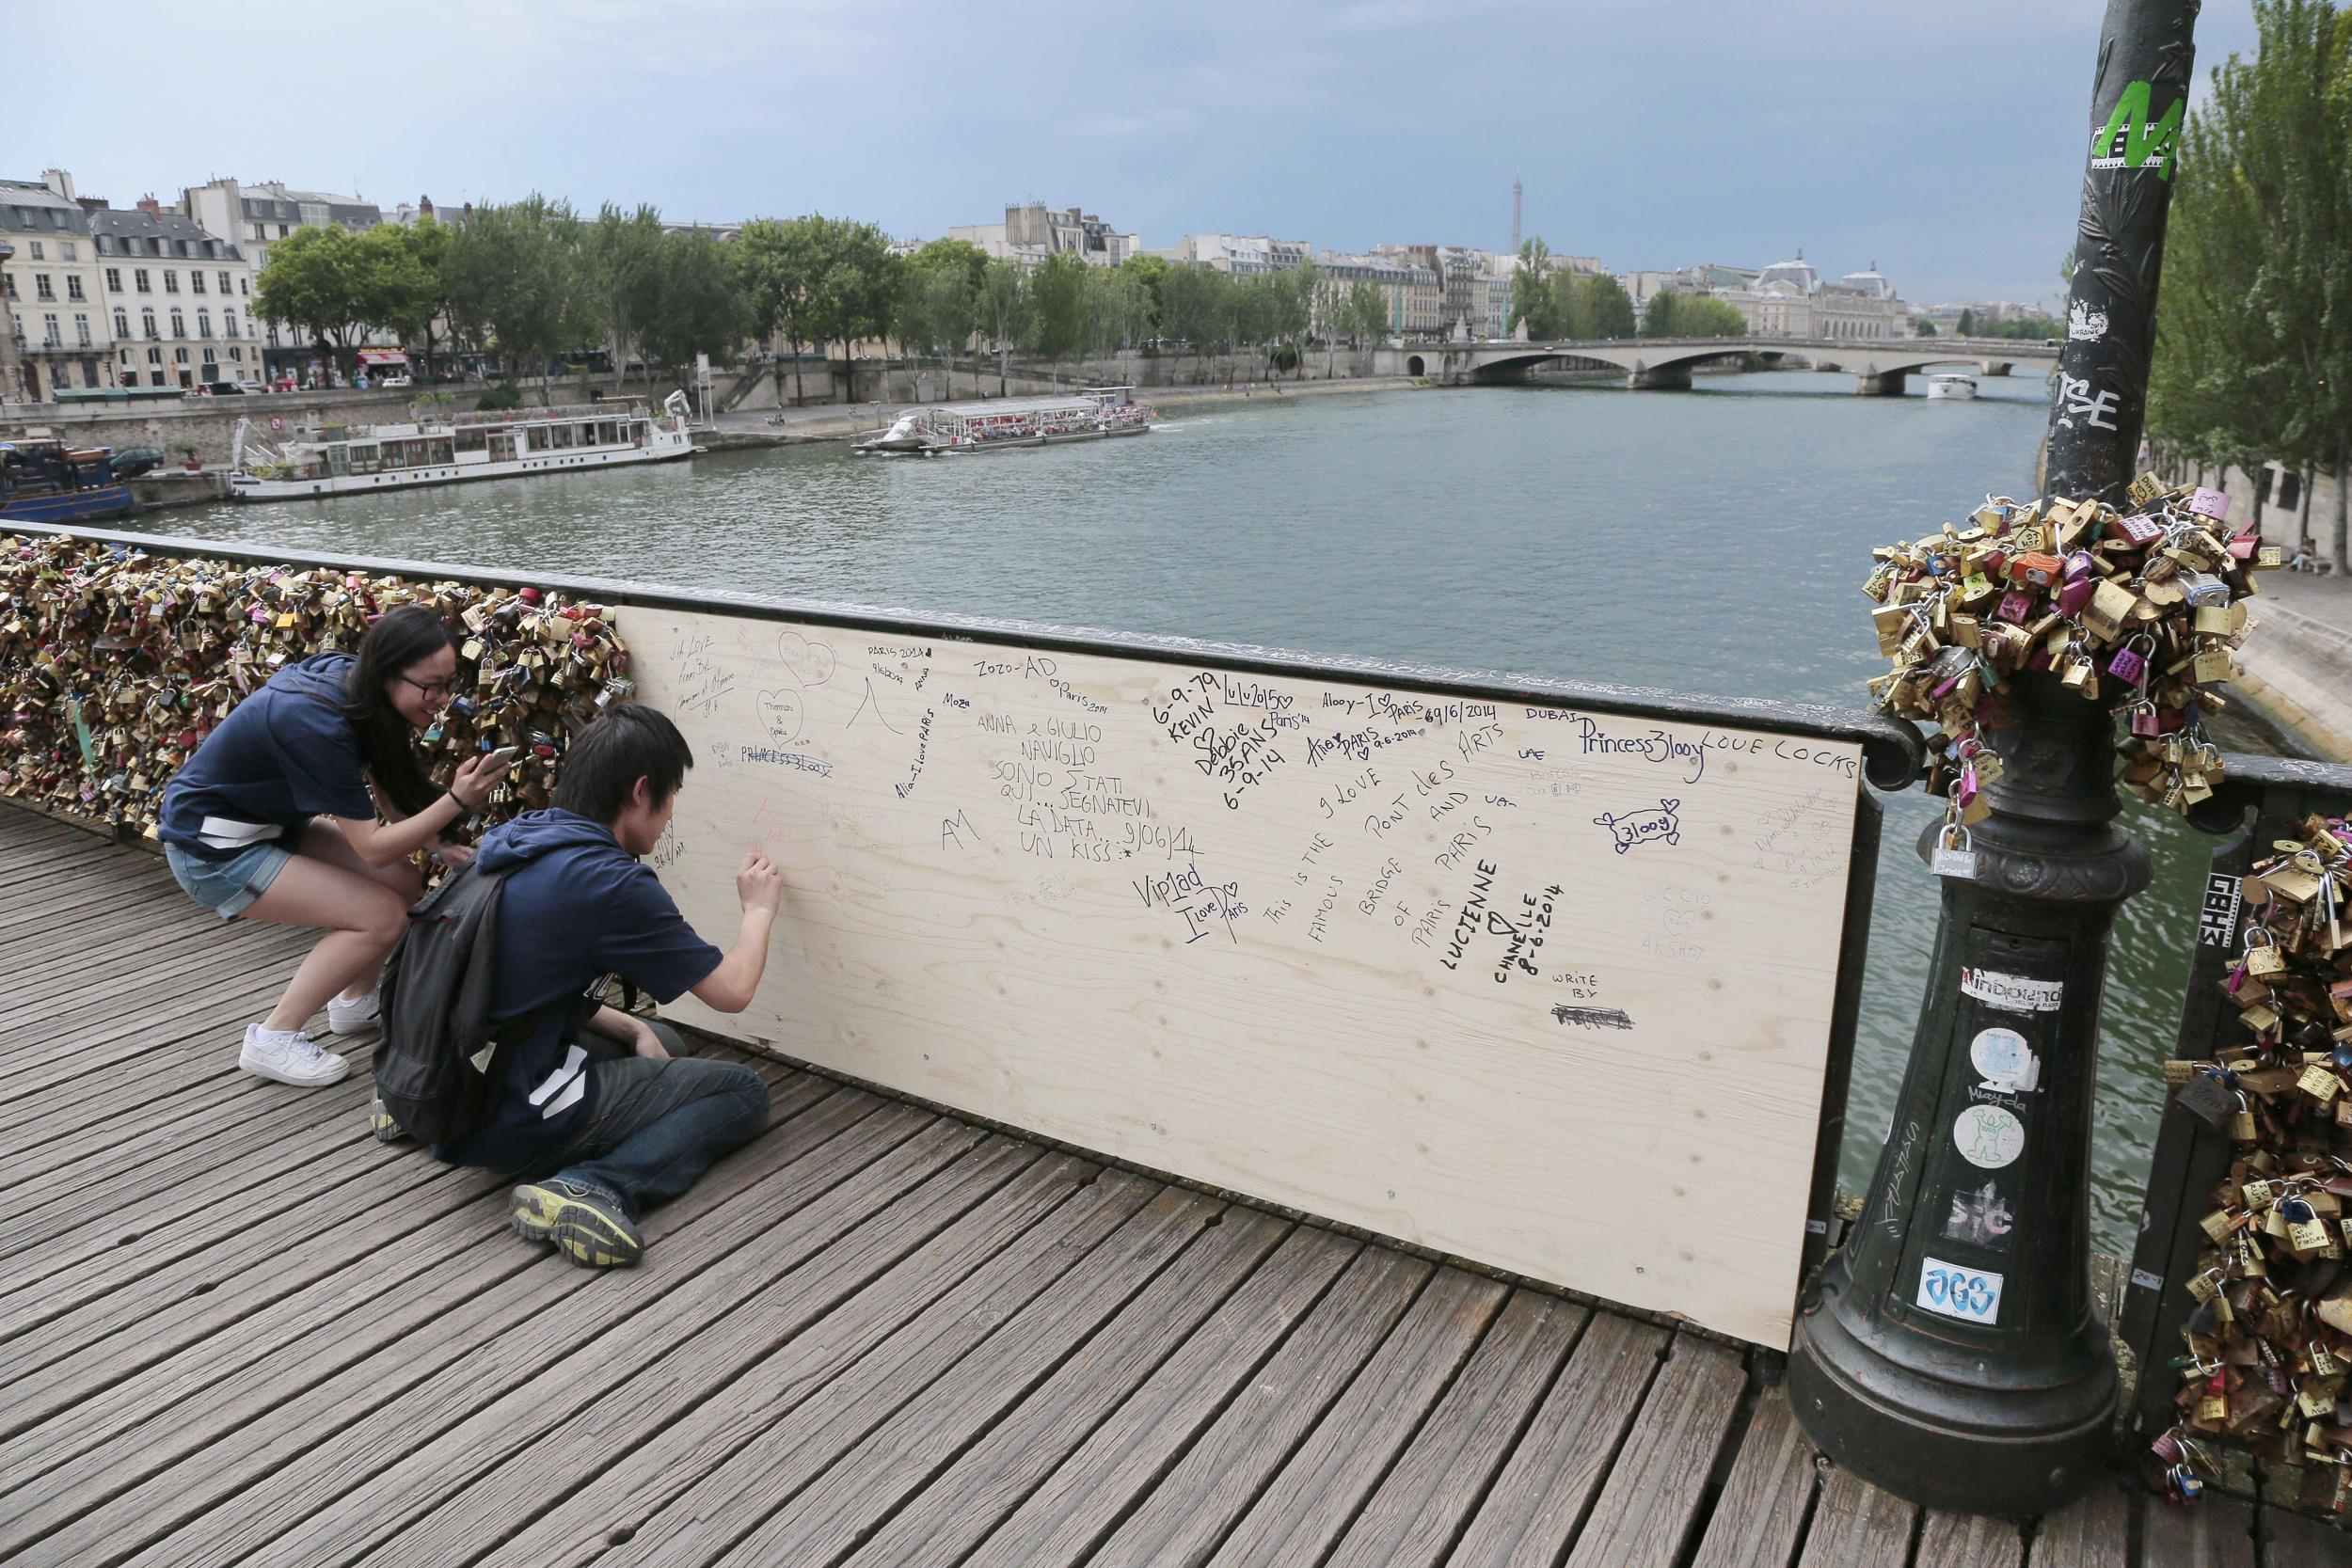 Image: People write inscriptions onto a wooden panel on the Pont des Arts bridge